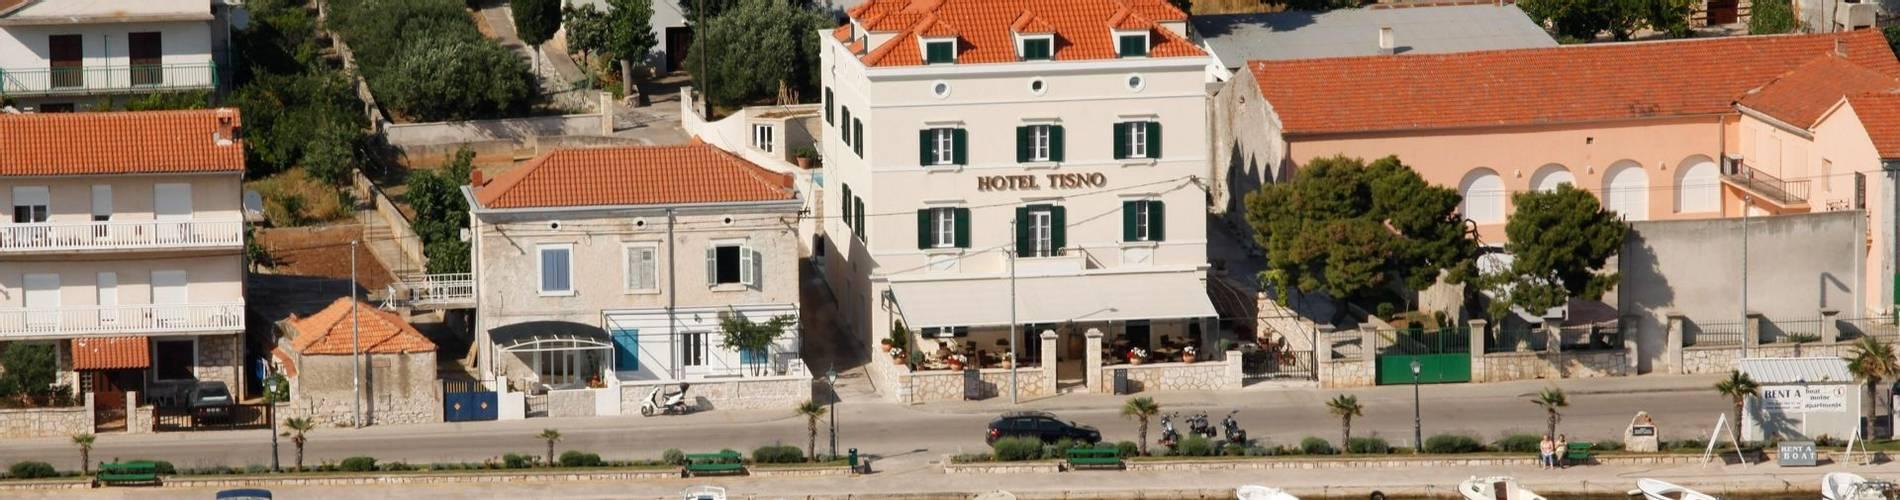 Aerial-shot-Tisno-Hotel.jpg